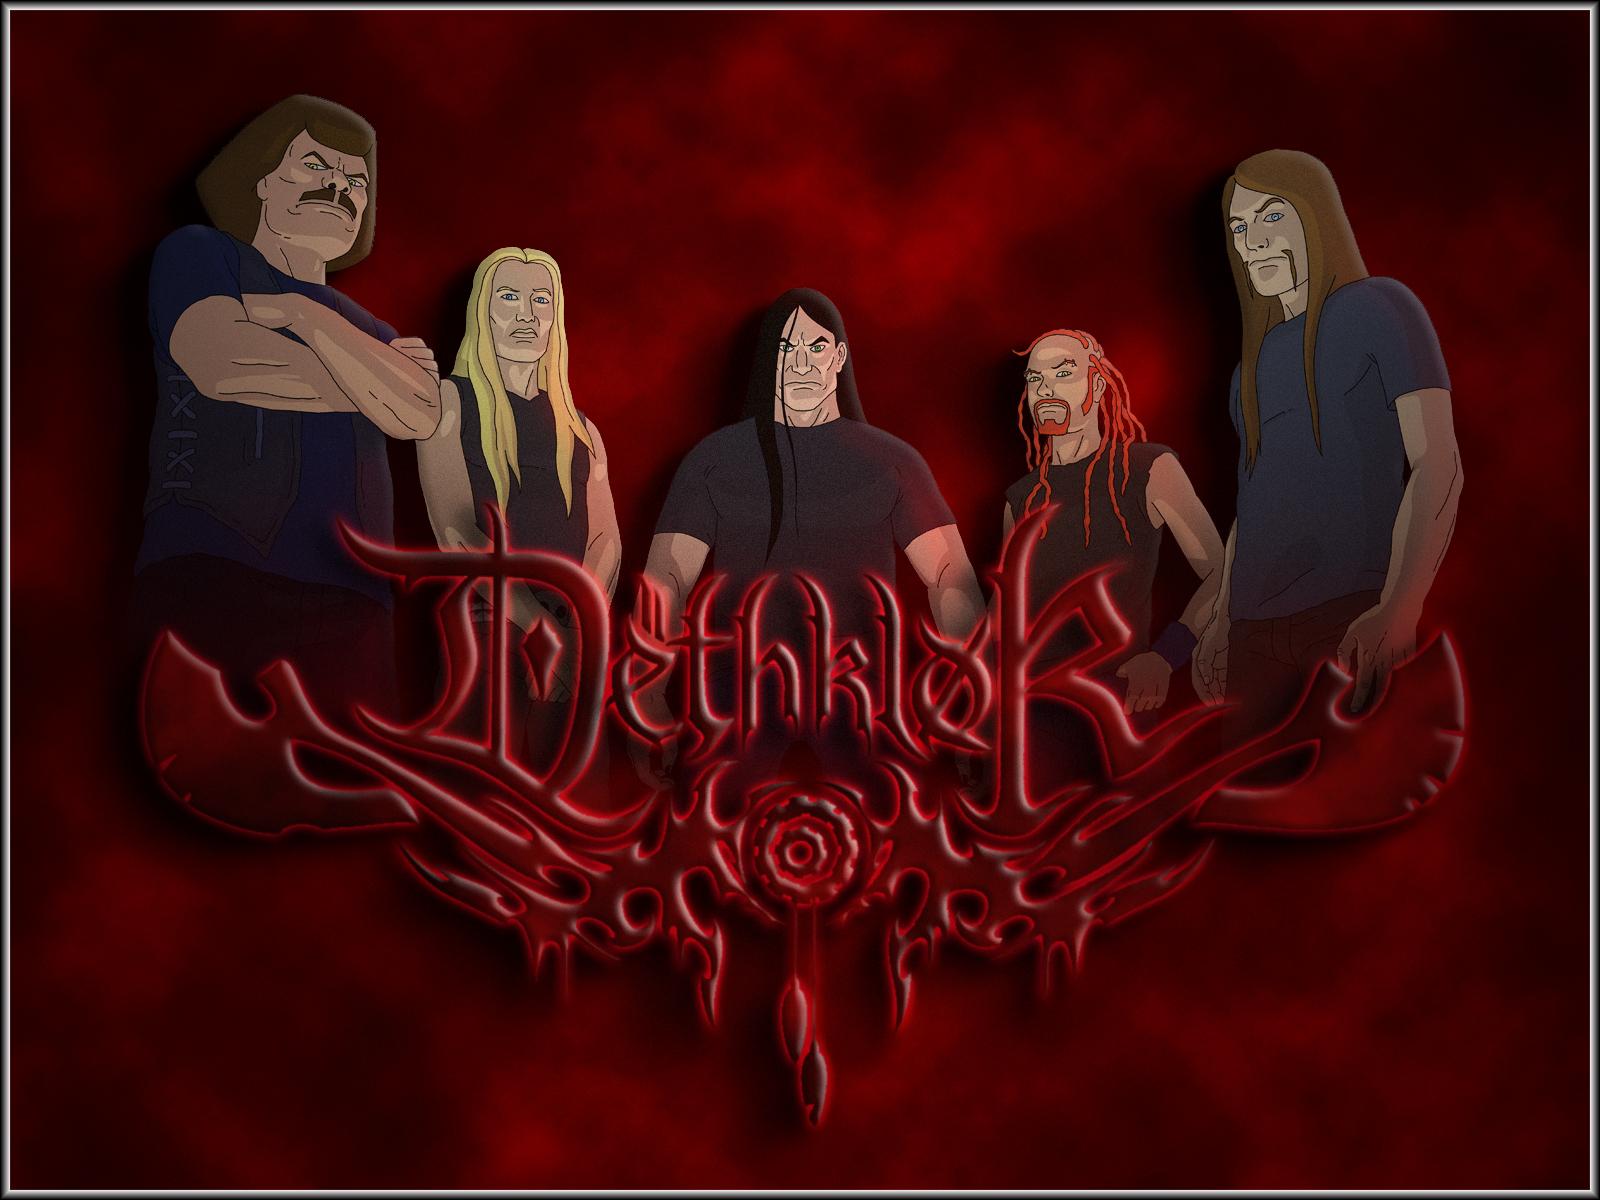 Download 1600x1200 Dethklok heavy metal music cartoons 1600x1200